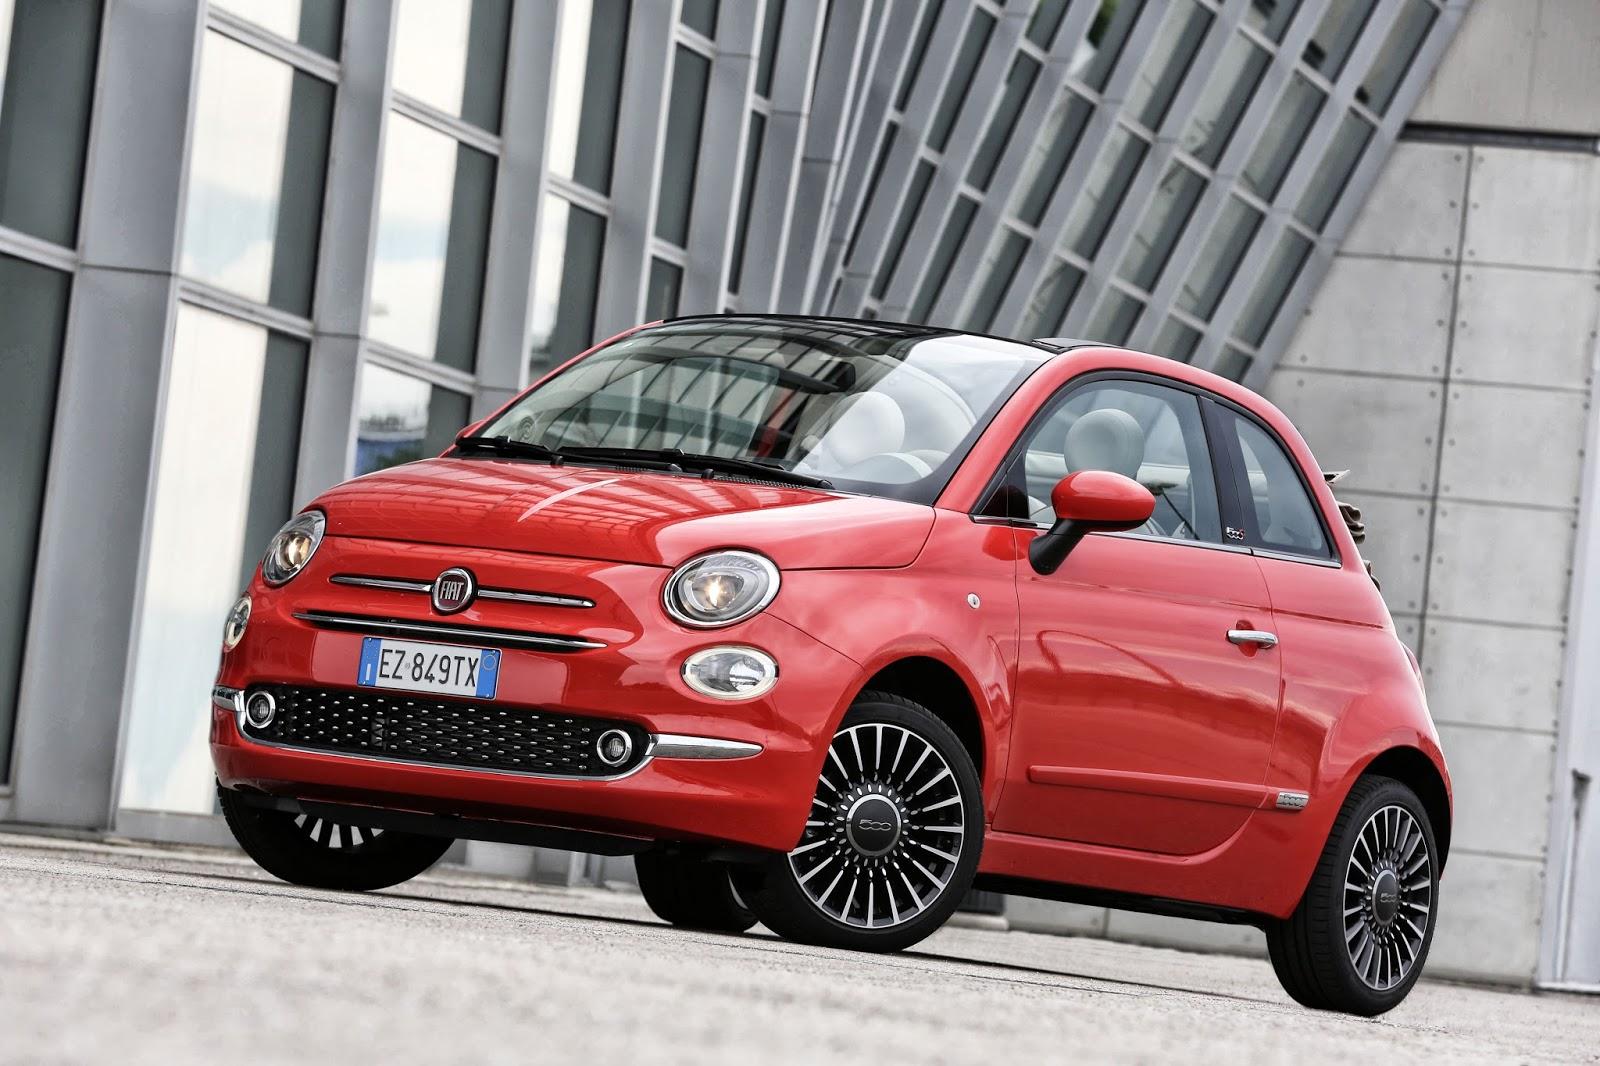 150703 FIAT Nuova 500 26 Η άφιξη του νέου Fiat 500 είναι γεγονός